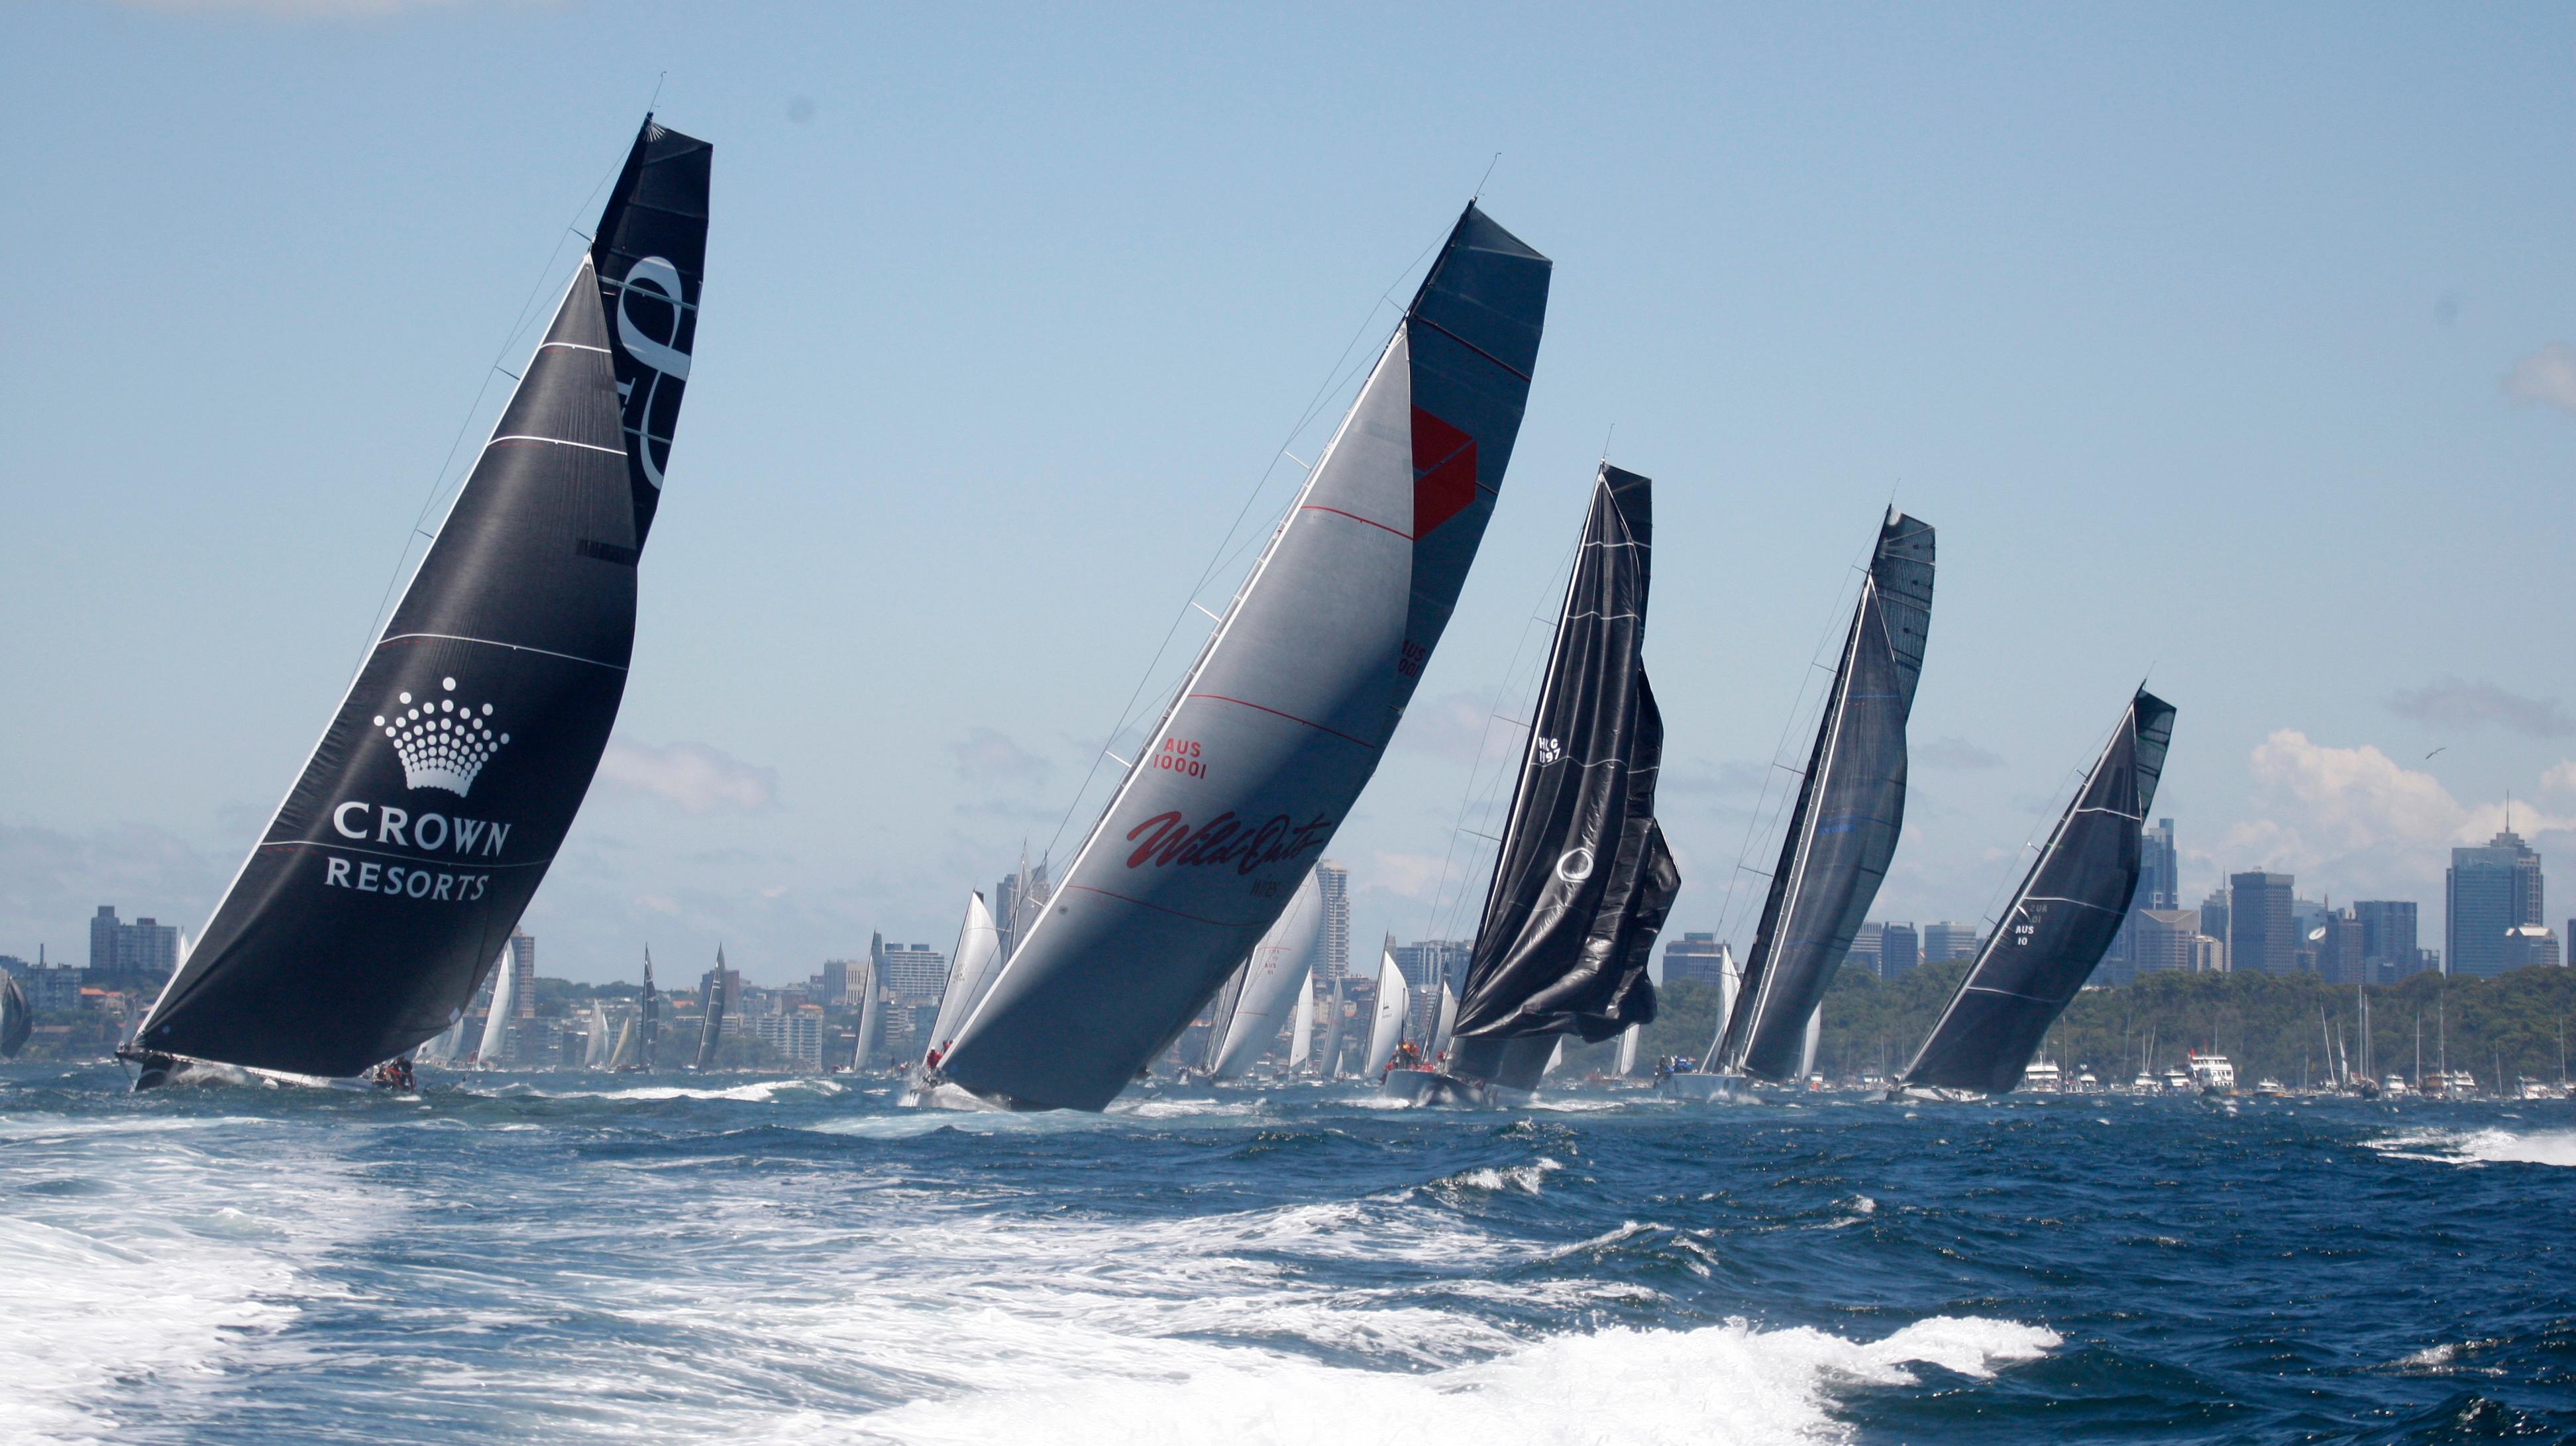 Sydney to Hobart Yacht Race Update with Steve Barker